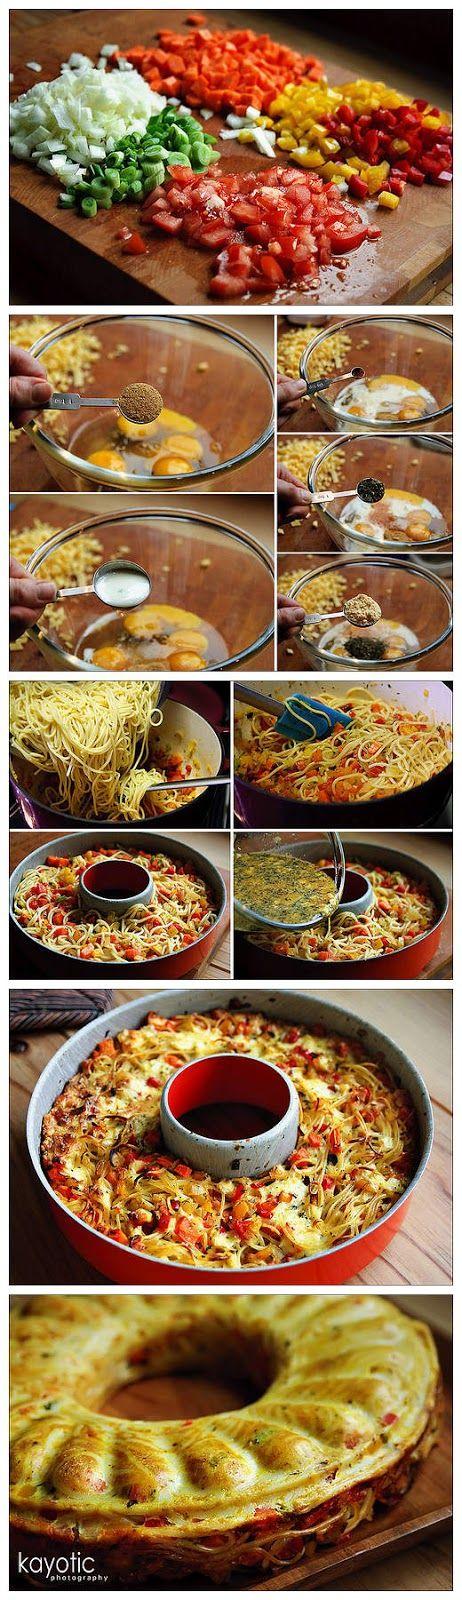 Spaghetti Pie Yasemin Aksu